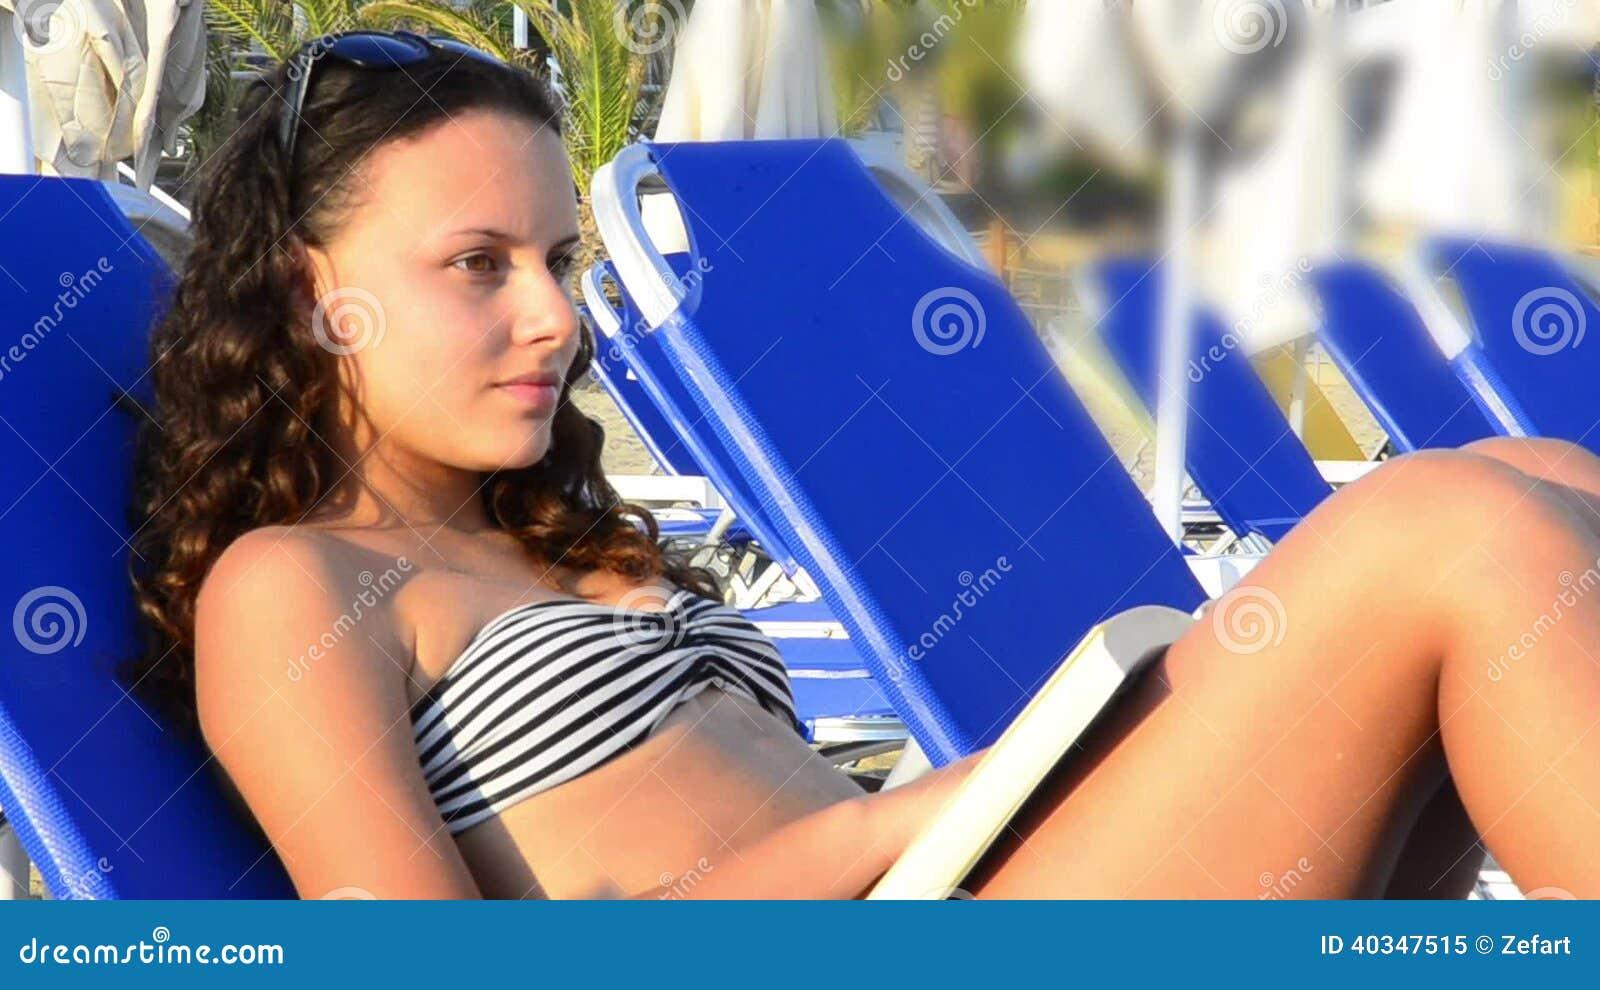 sunbathing beach on girls Teen